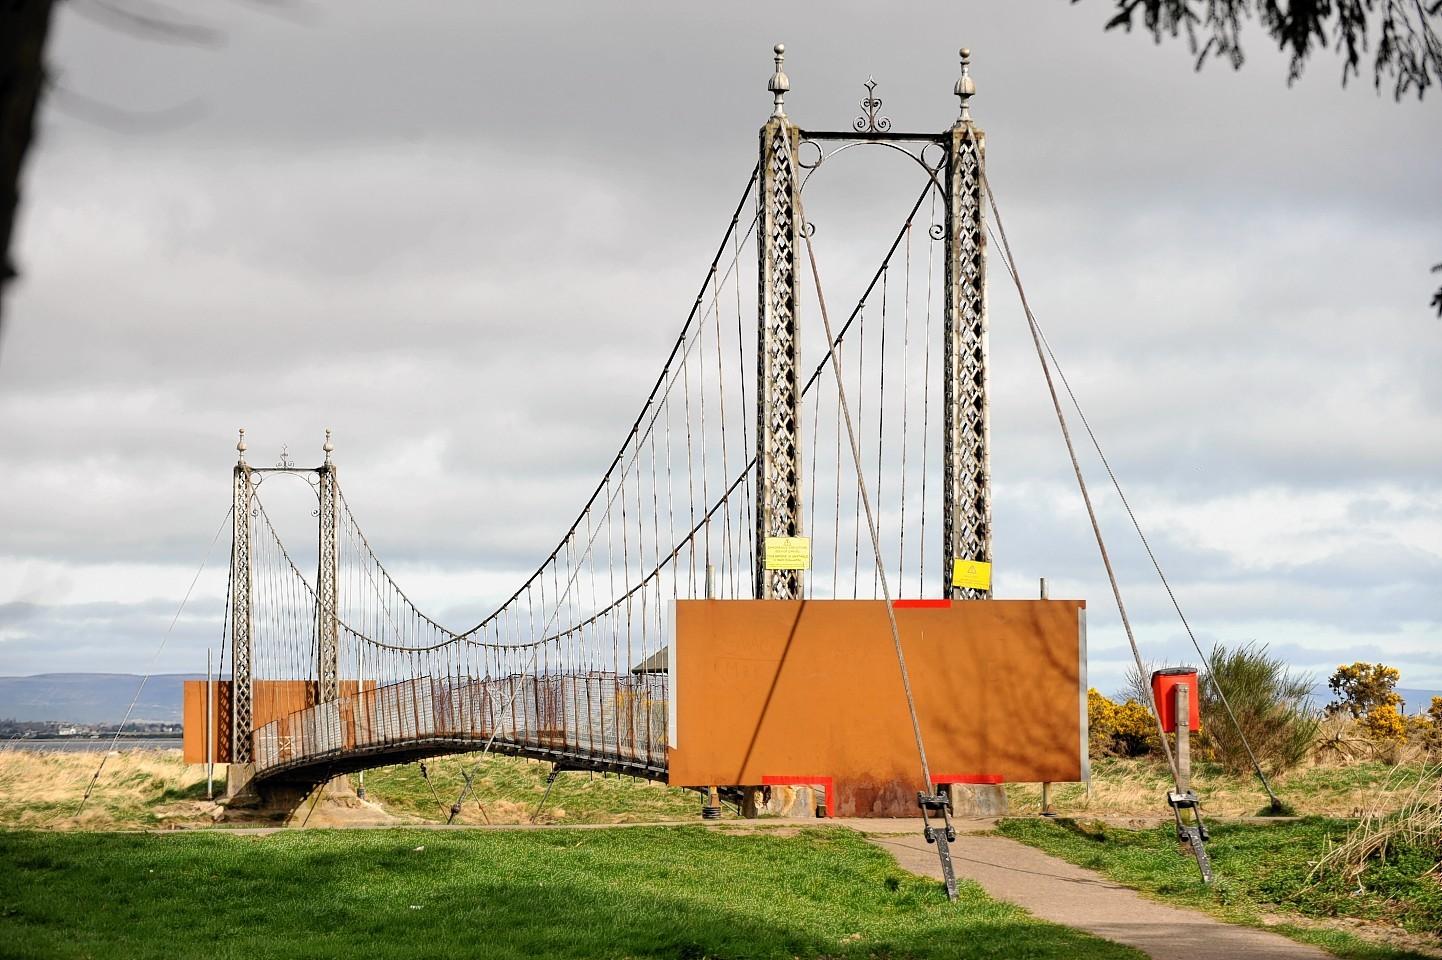 The Alexandra Bridge in Tain